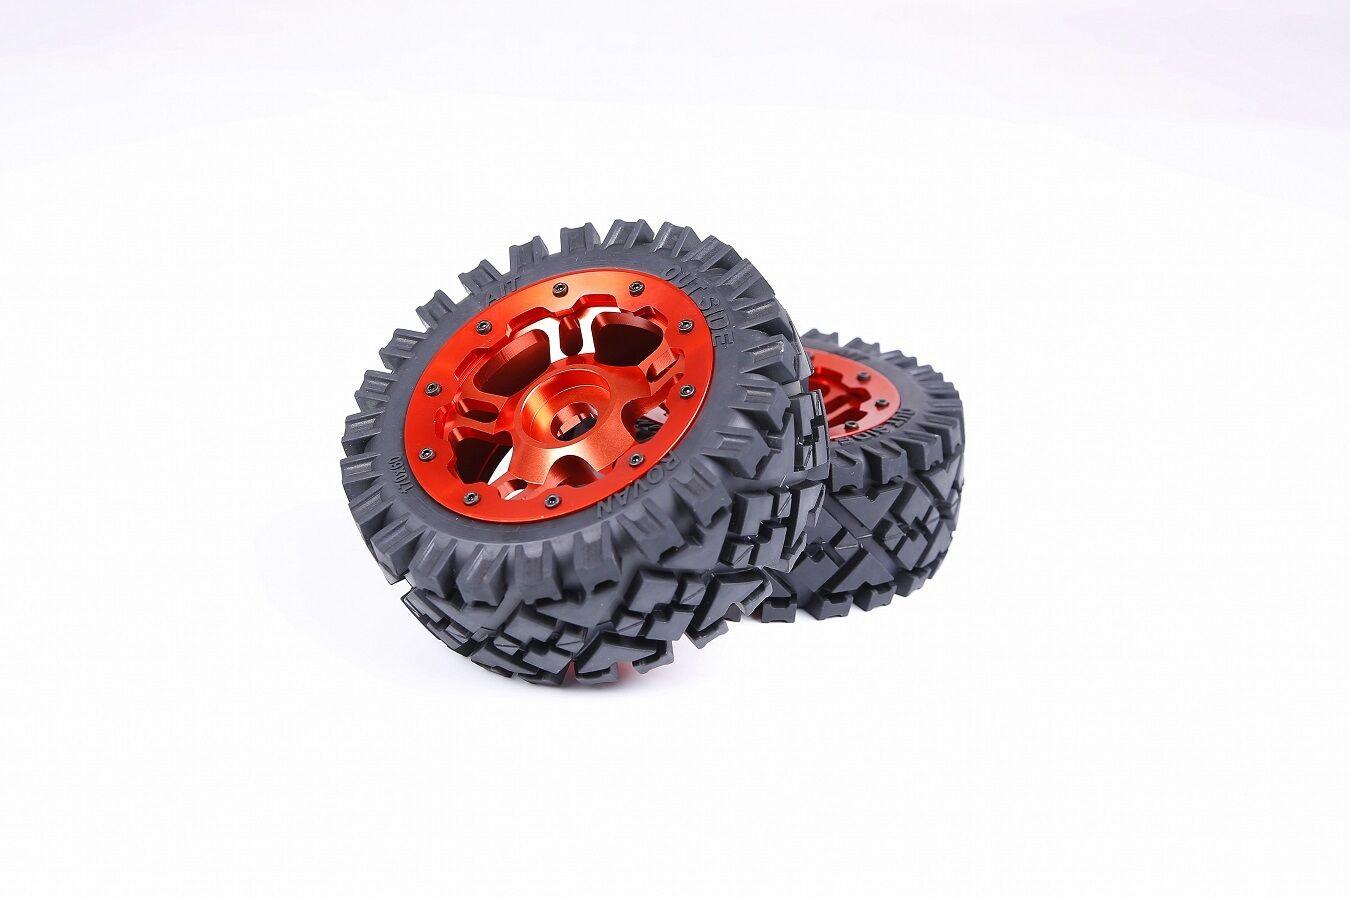 - alle - terraner reifen mit Orange - roten hub hat 2pcs fr hpi baja 5b